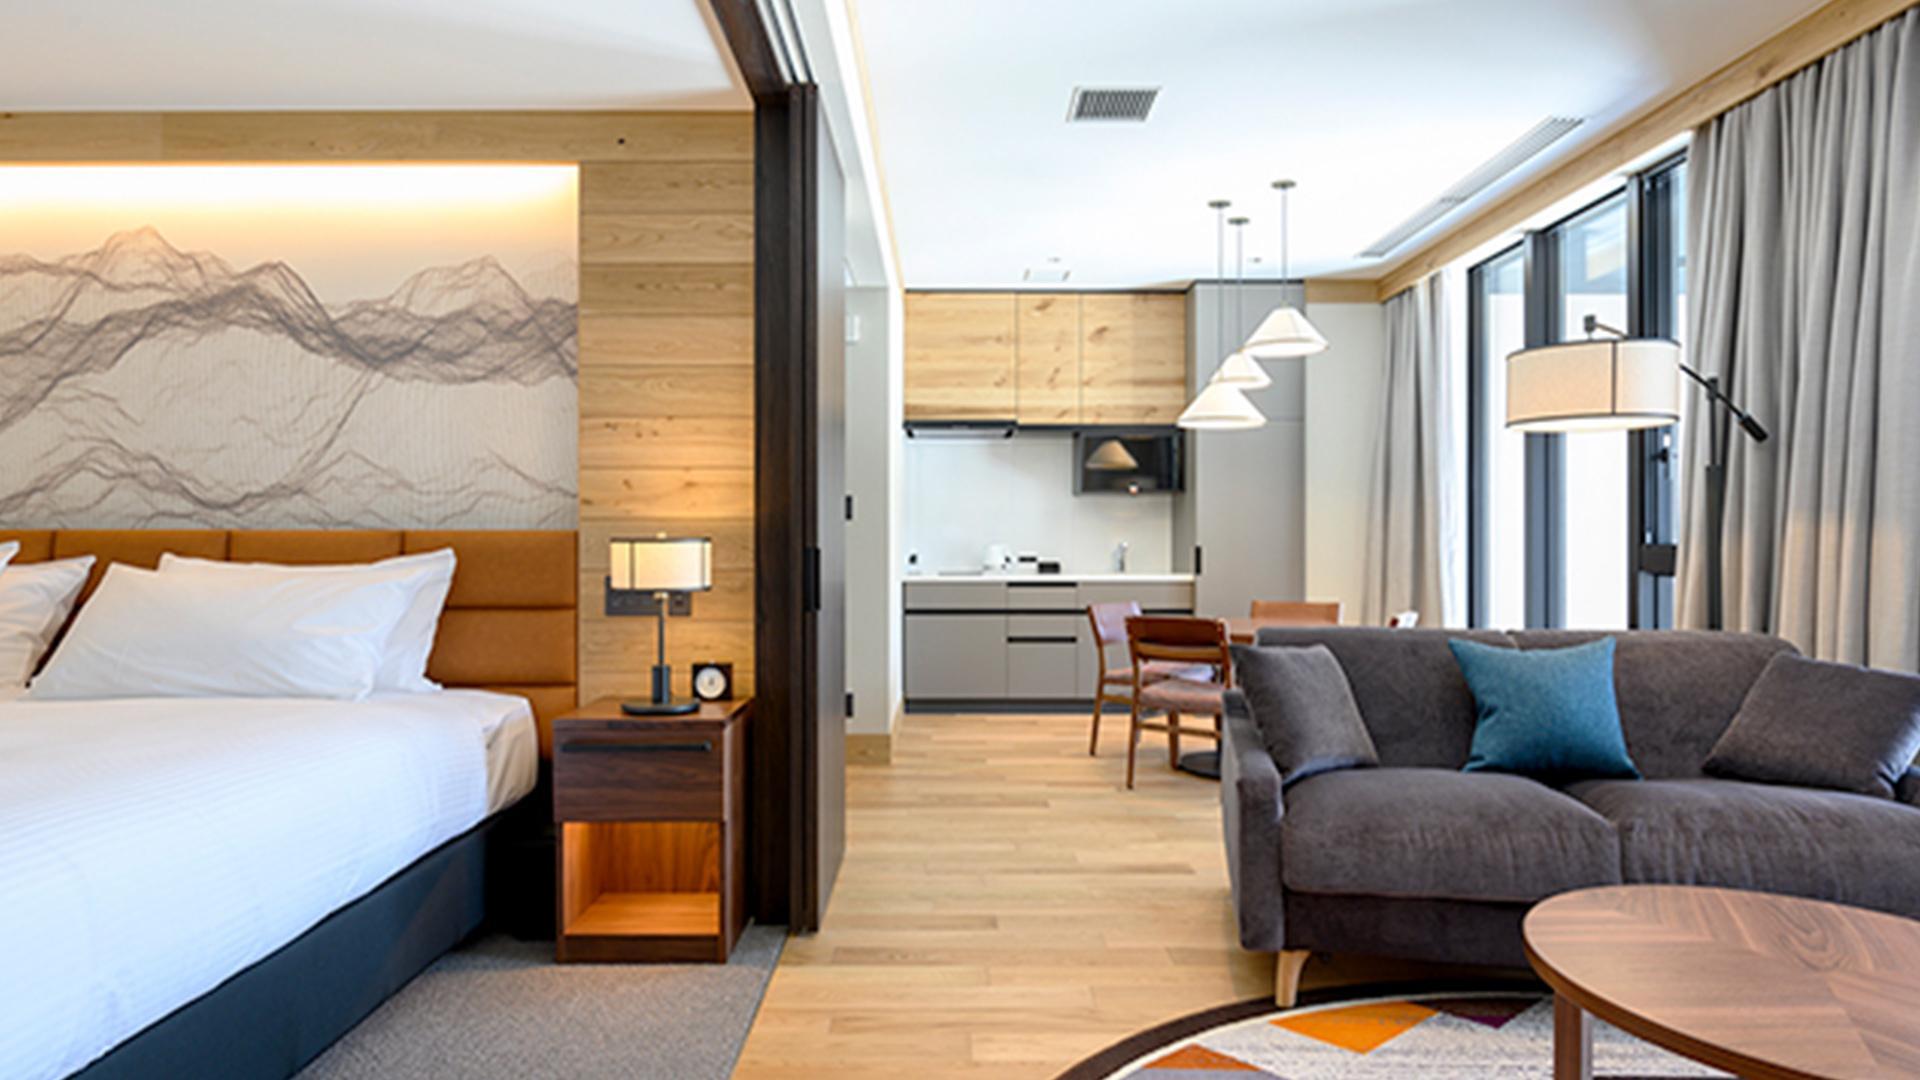 One-Bedroom Suite image 1 at Yu Kiroro by Yoichi District, Hokkaido, Japan